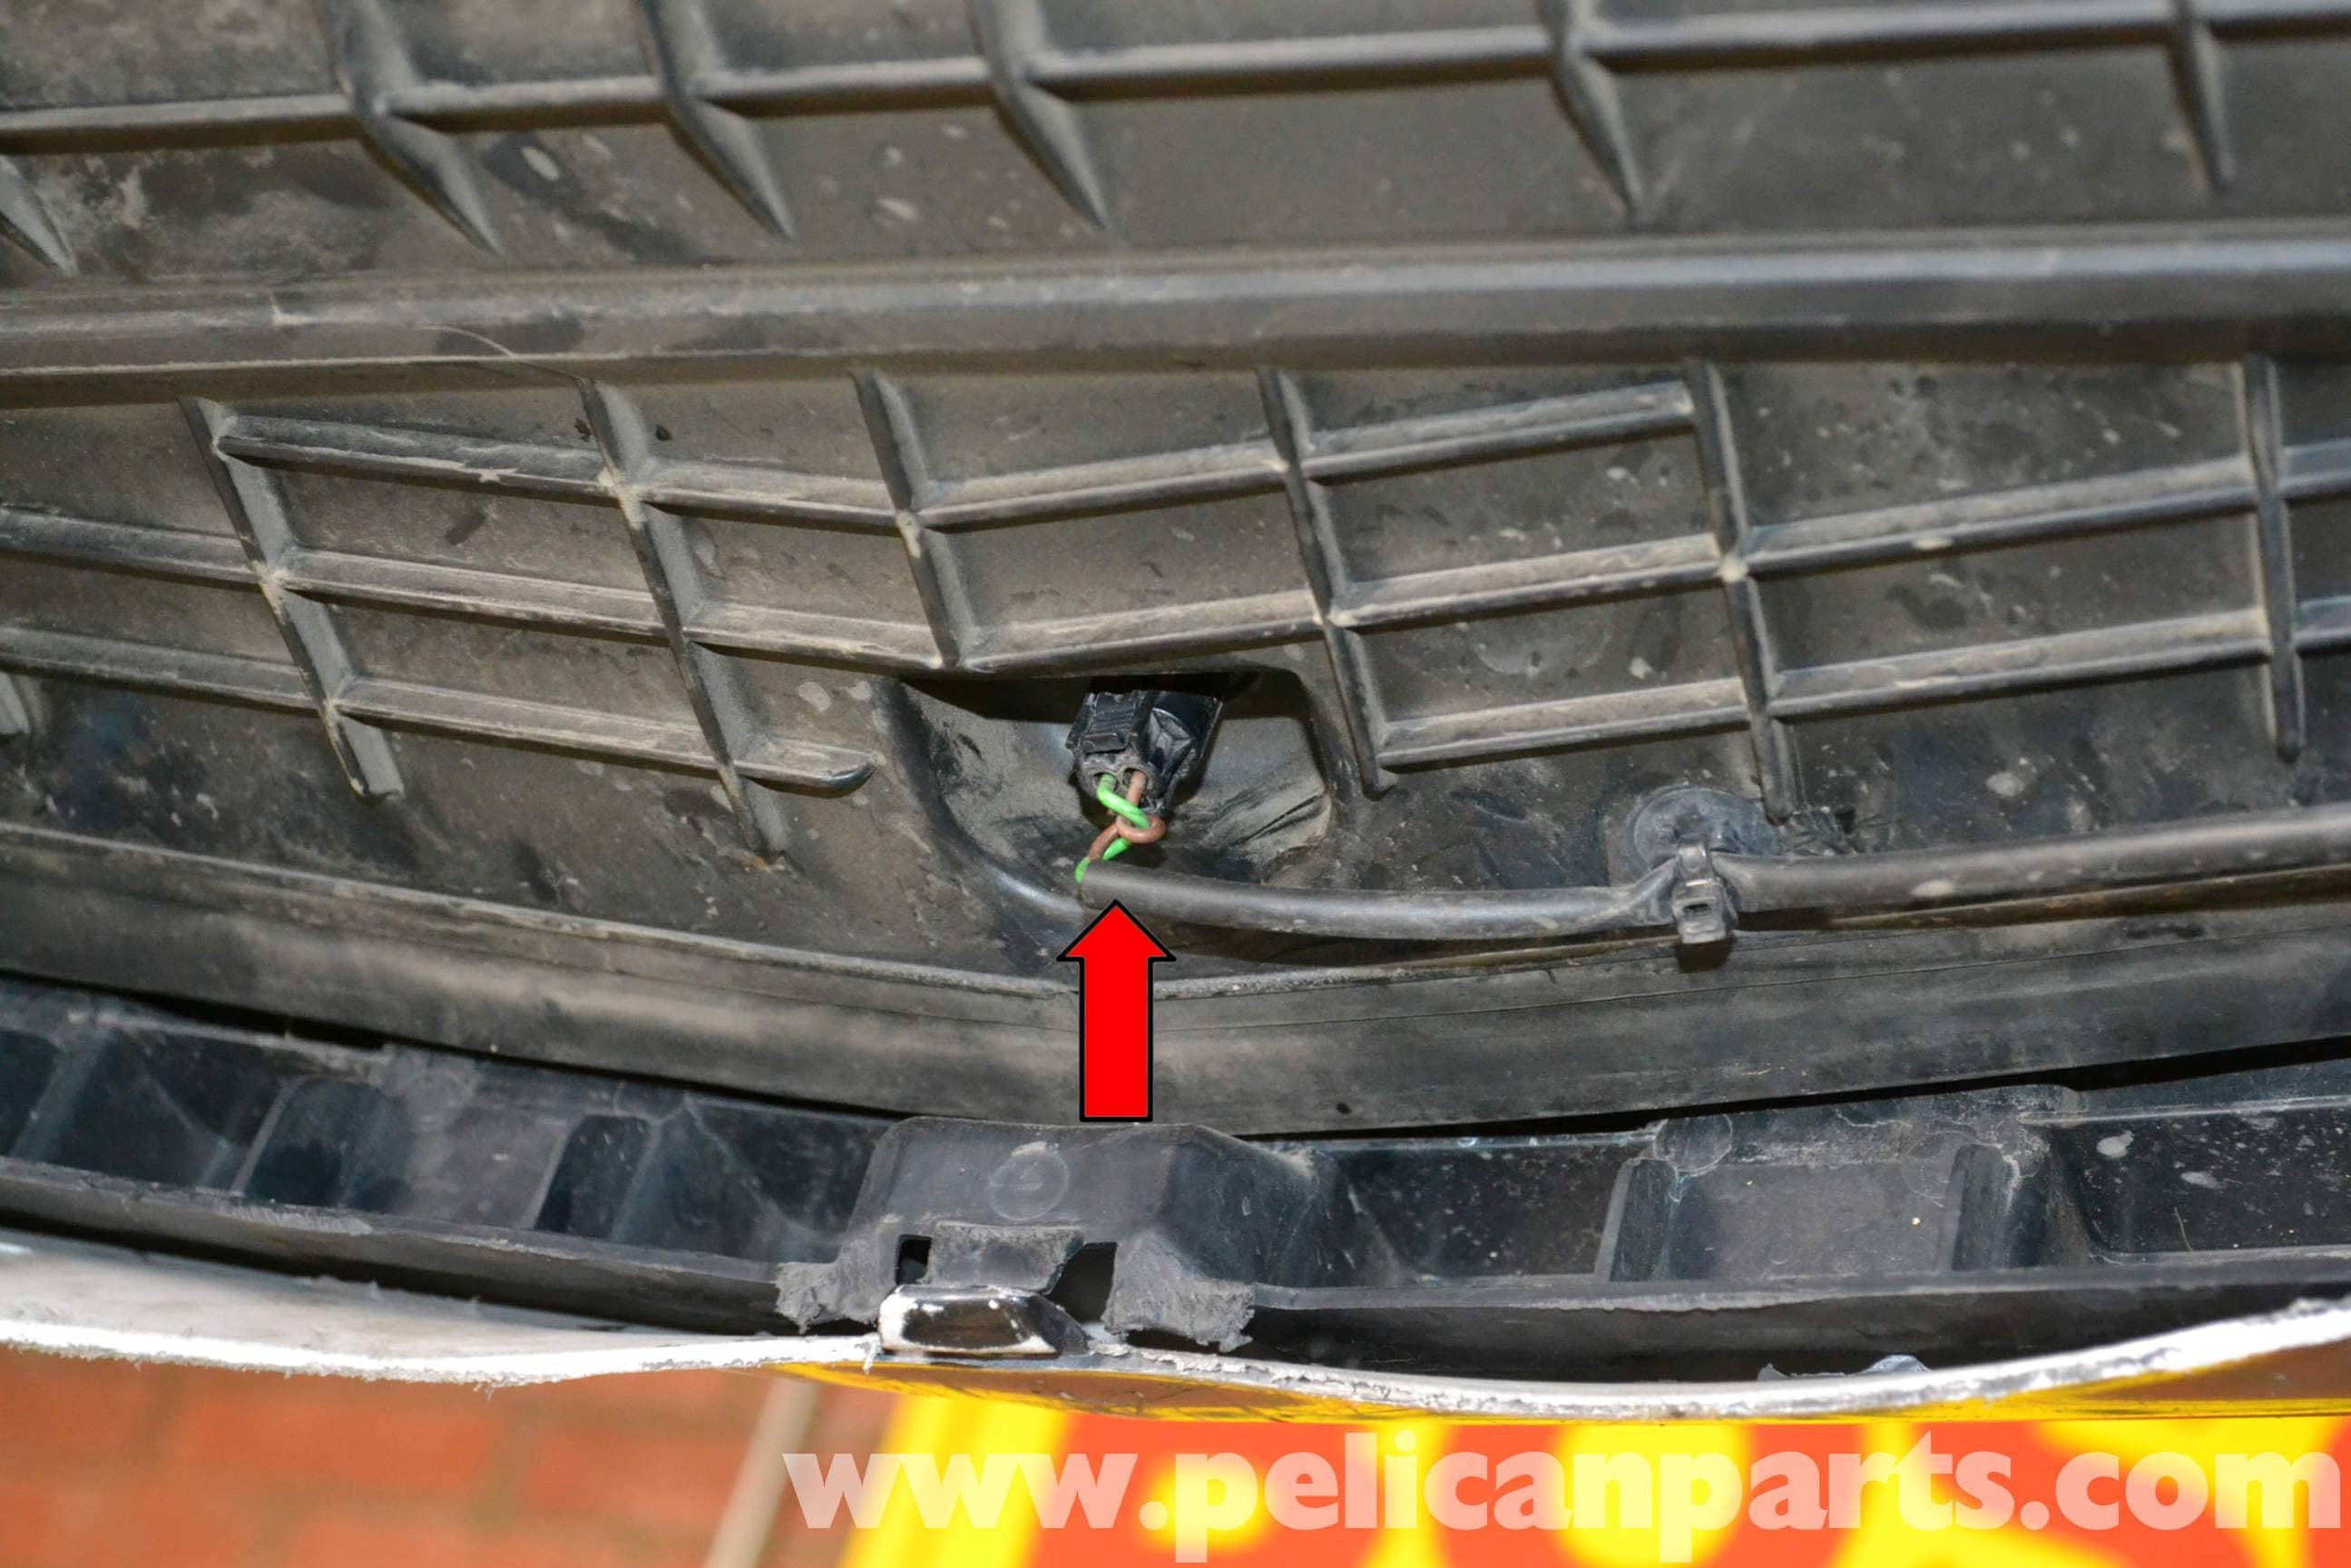 Mercedes Benz W204 Ambient Air Temperature Sensor Replacement R350 Fuse Diagram Large Image Extra